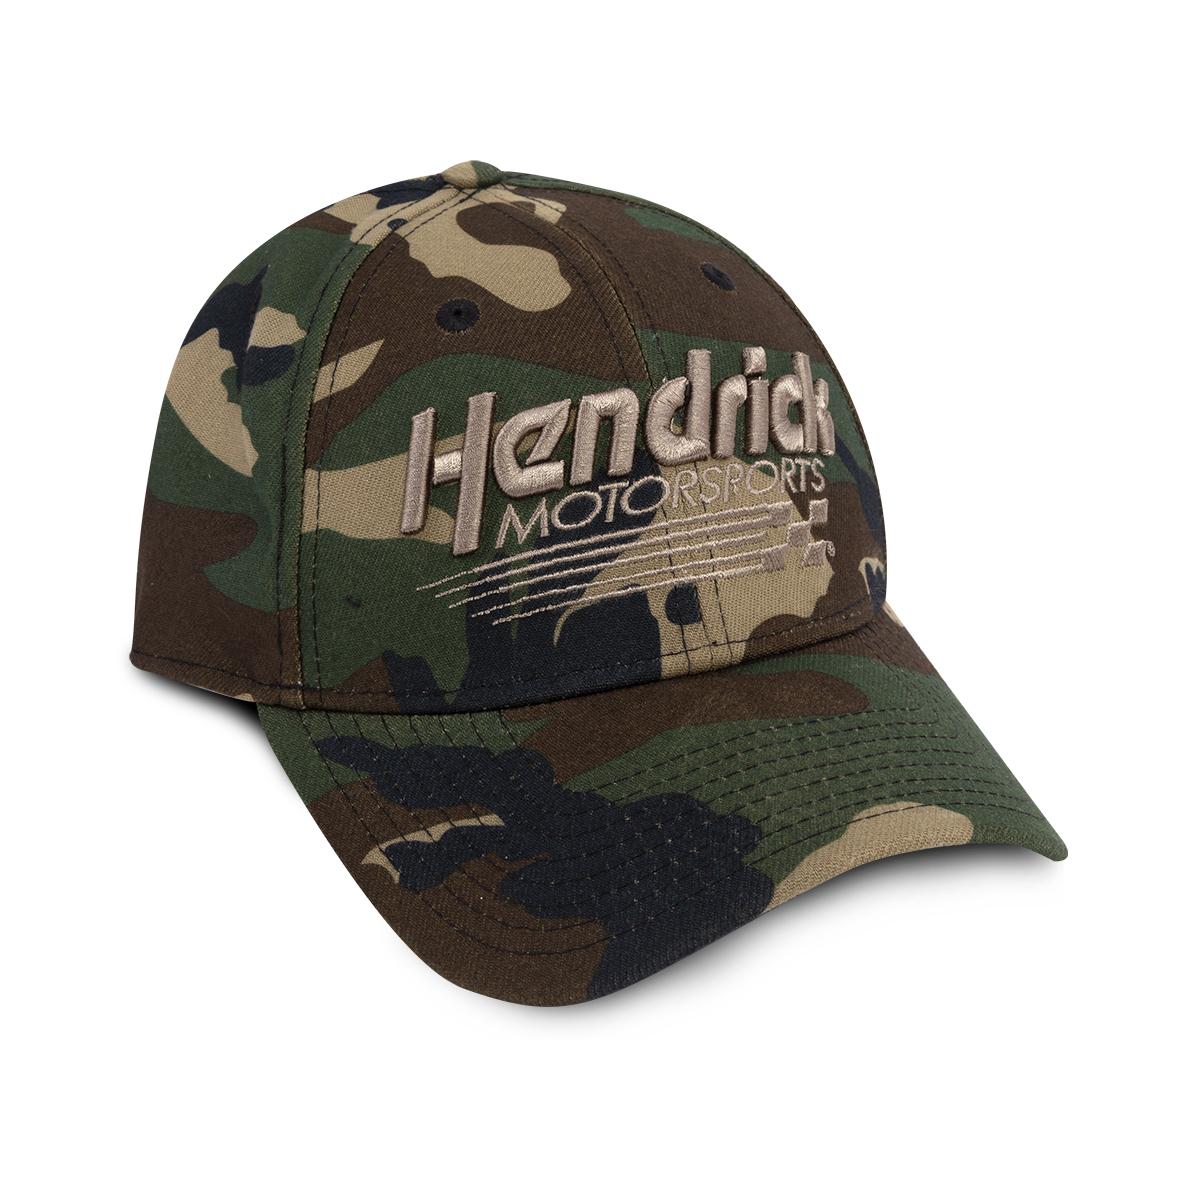 2019 NASCAR Hendrick Motorsports Camo 39Thirty New Era Hat